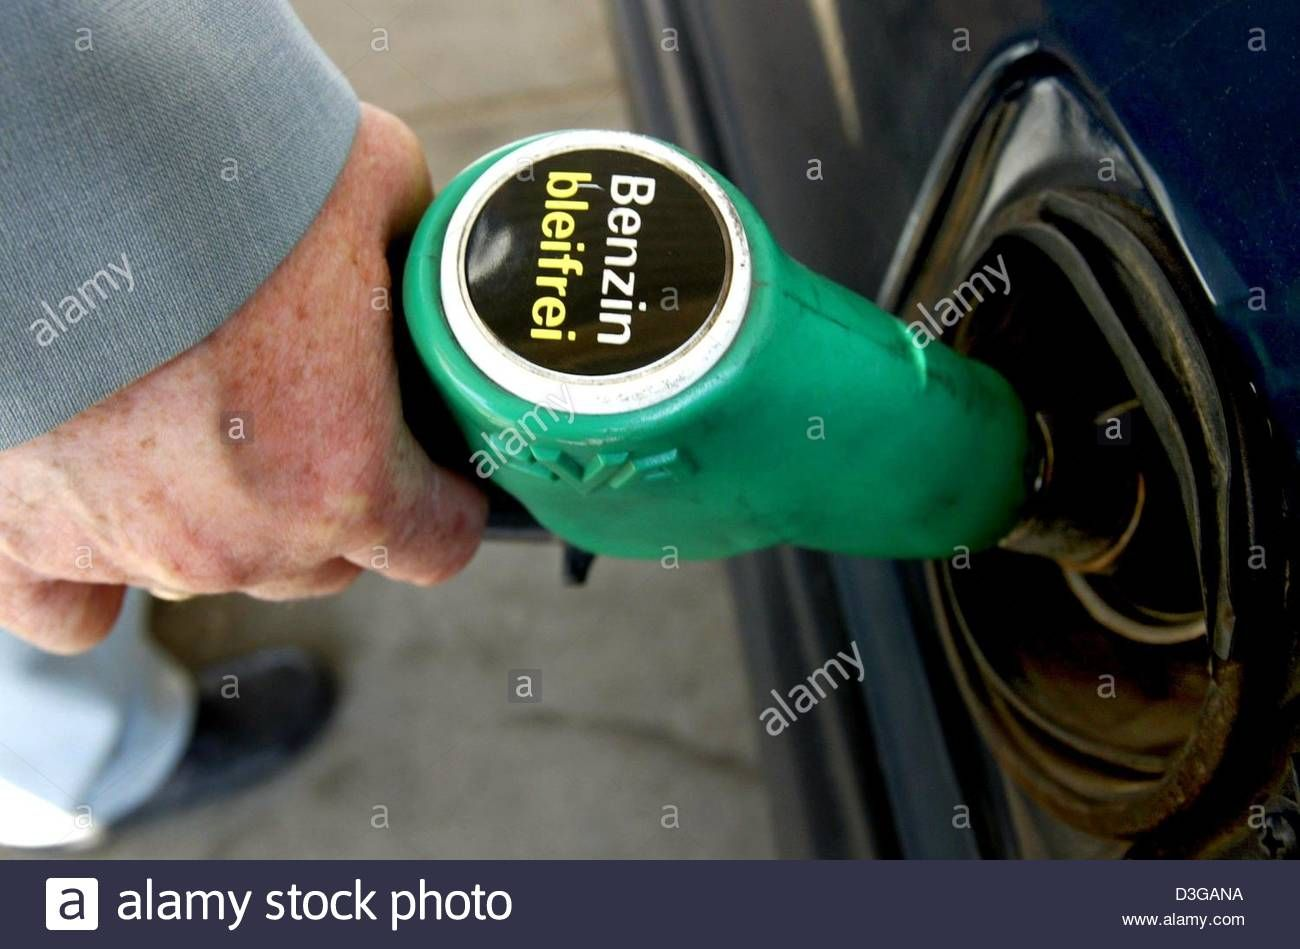 Benzin Preise steigen stark an